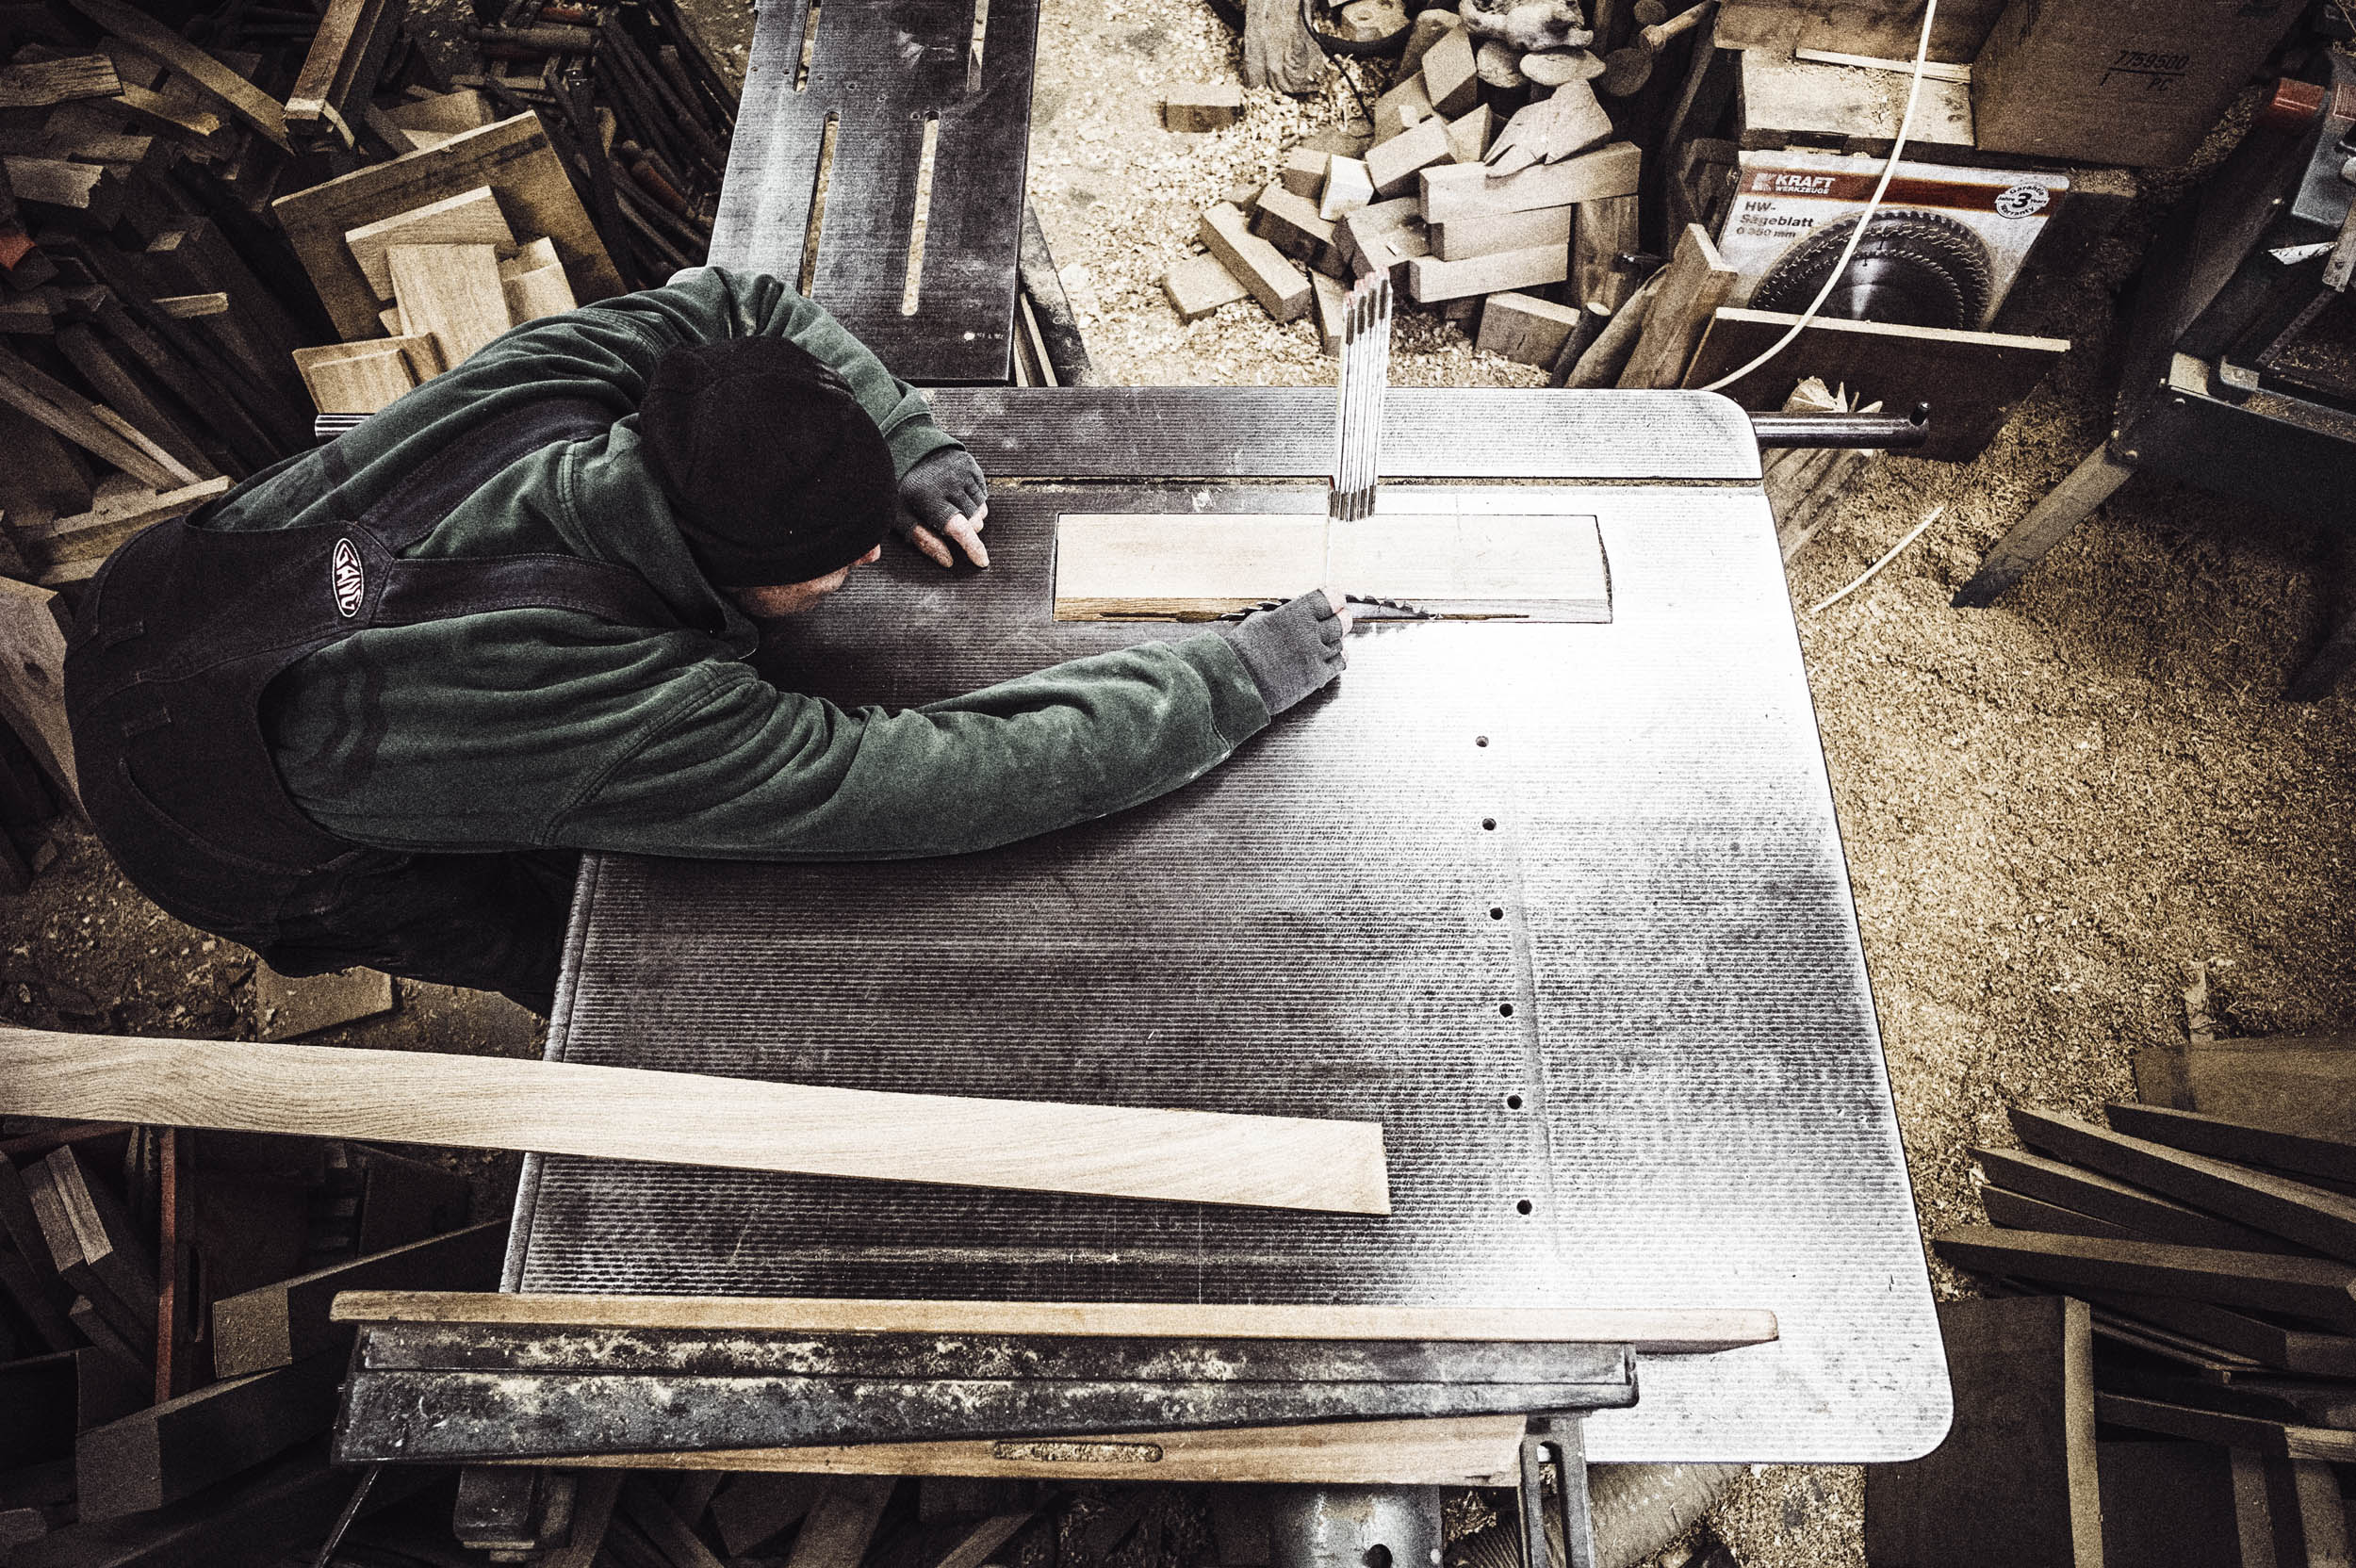 seifertuebler-corporate-handcraft-woodsculpture-vogel-08.jpg